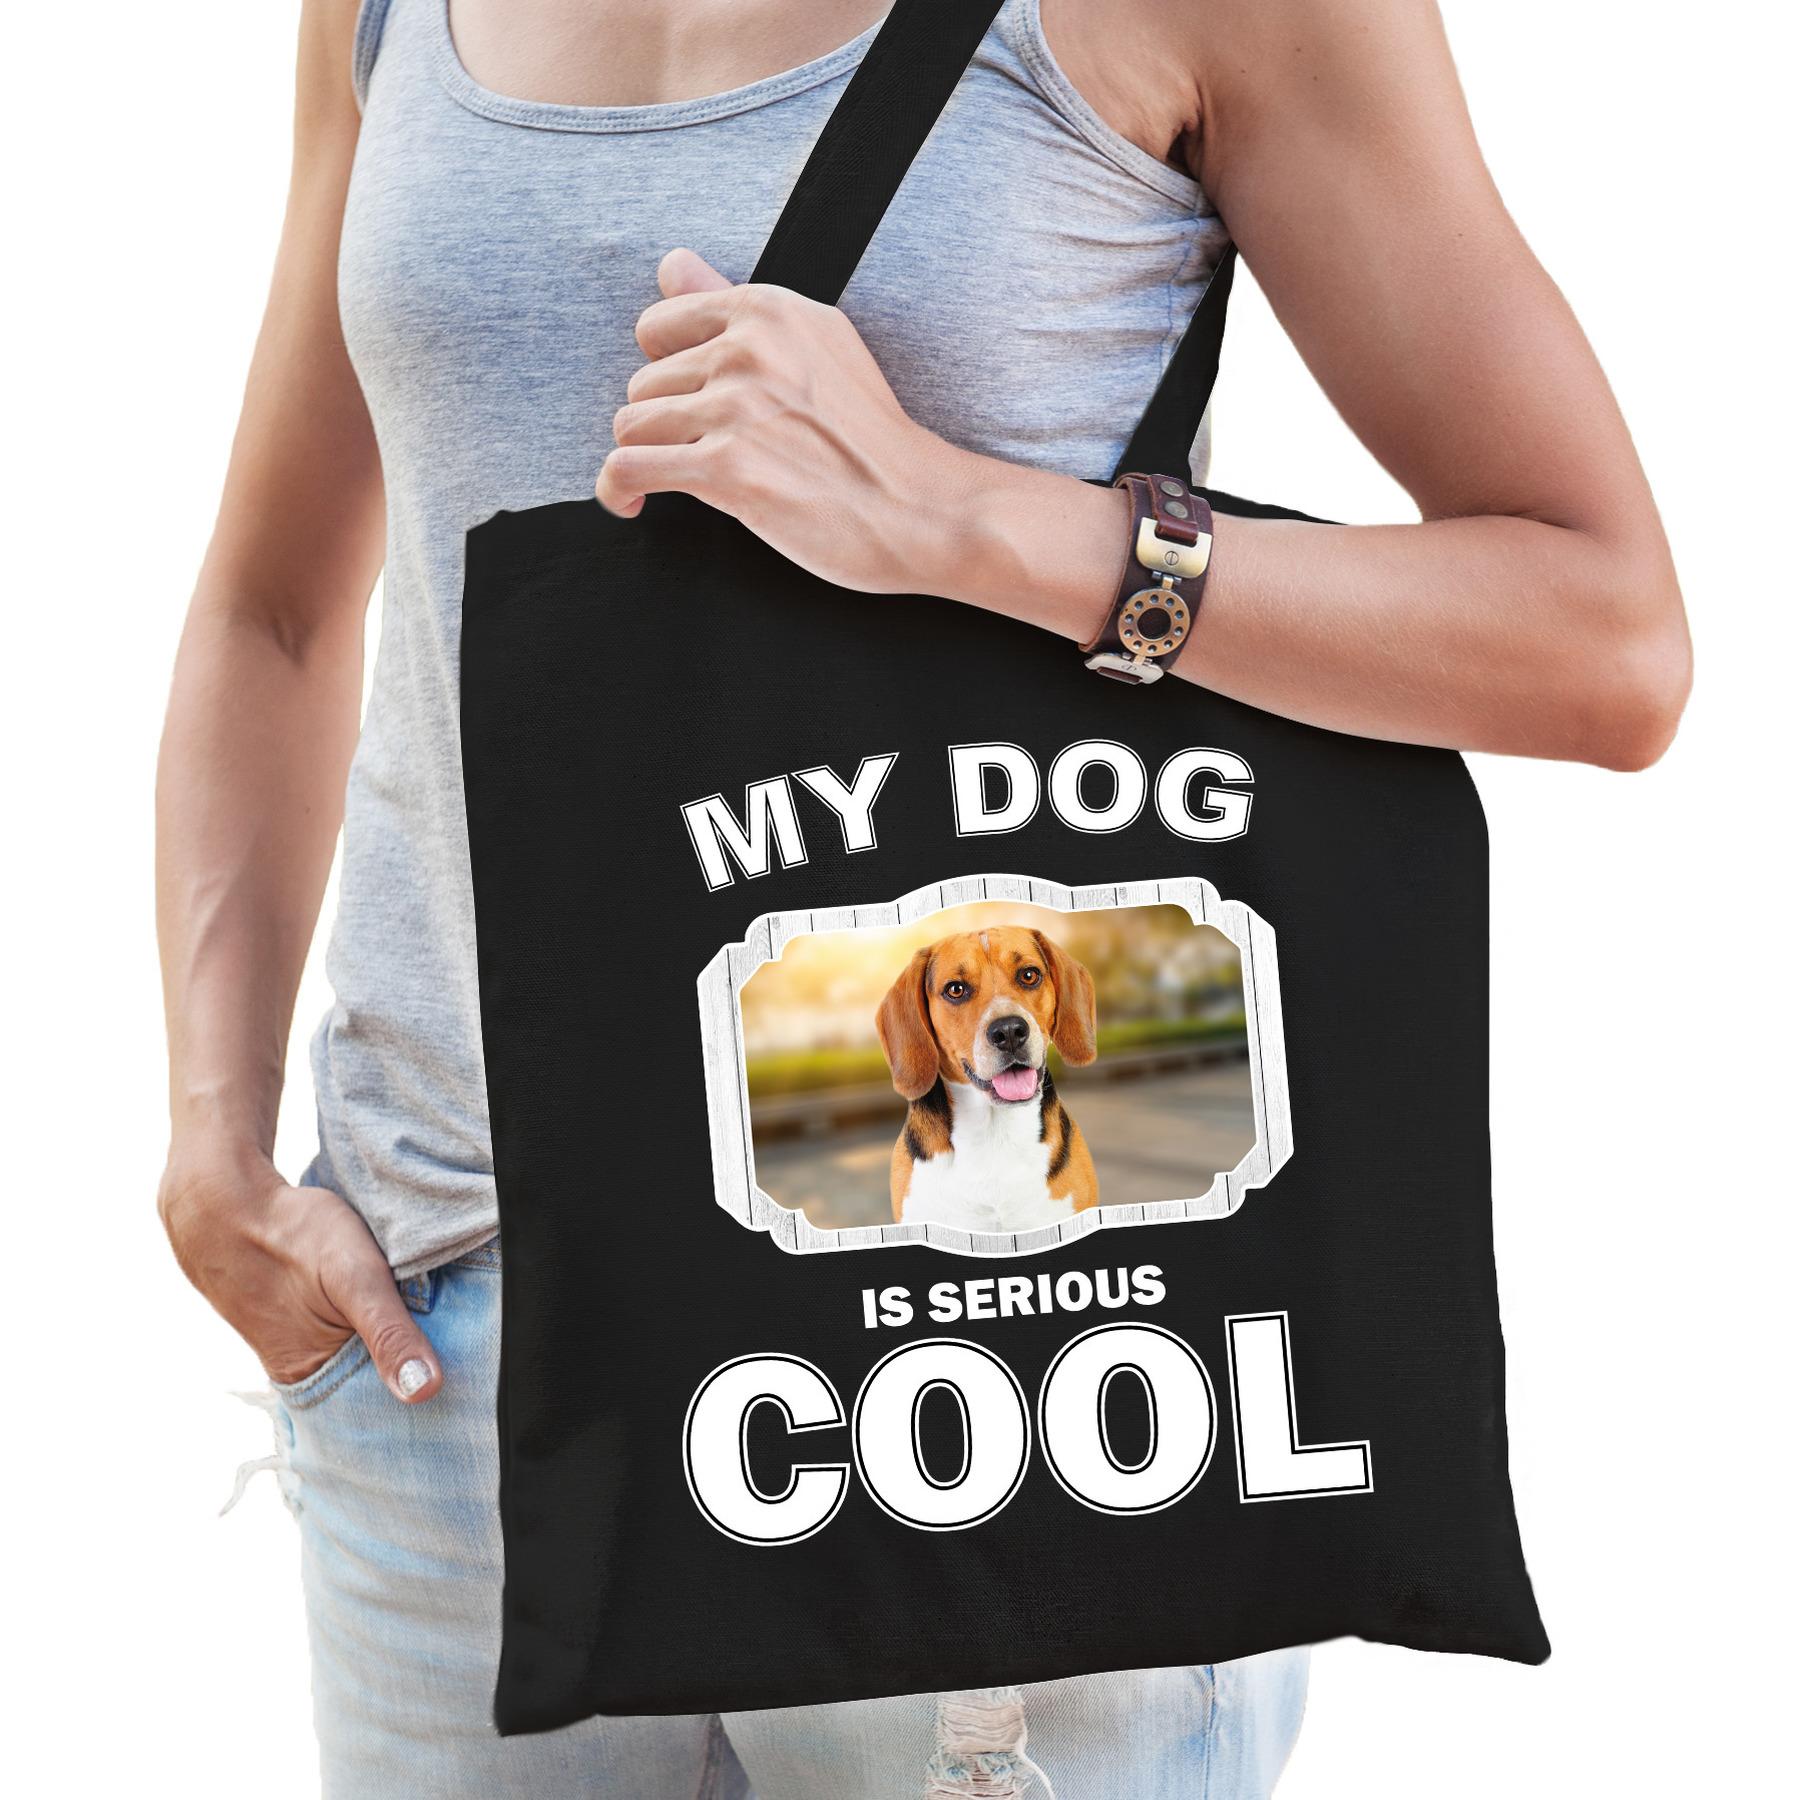 Katoenen tasje my dog is serious cool zwart - Beagle honden cadeau tas